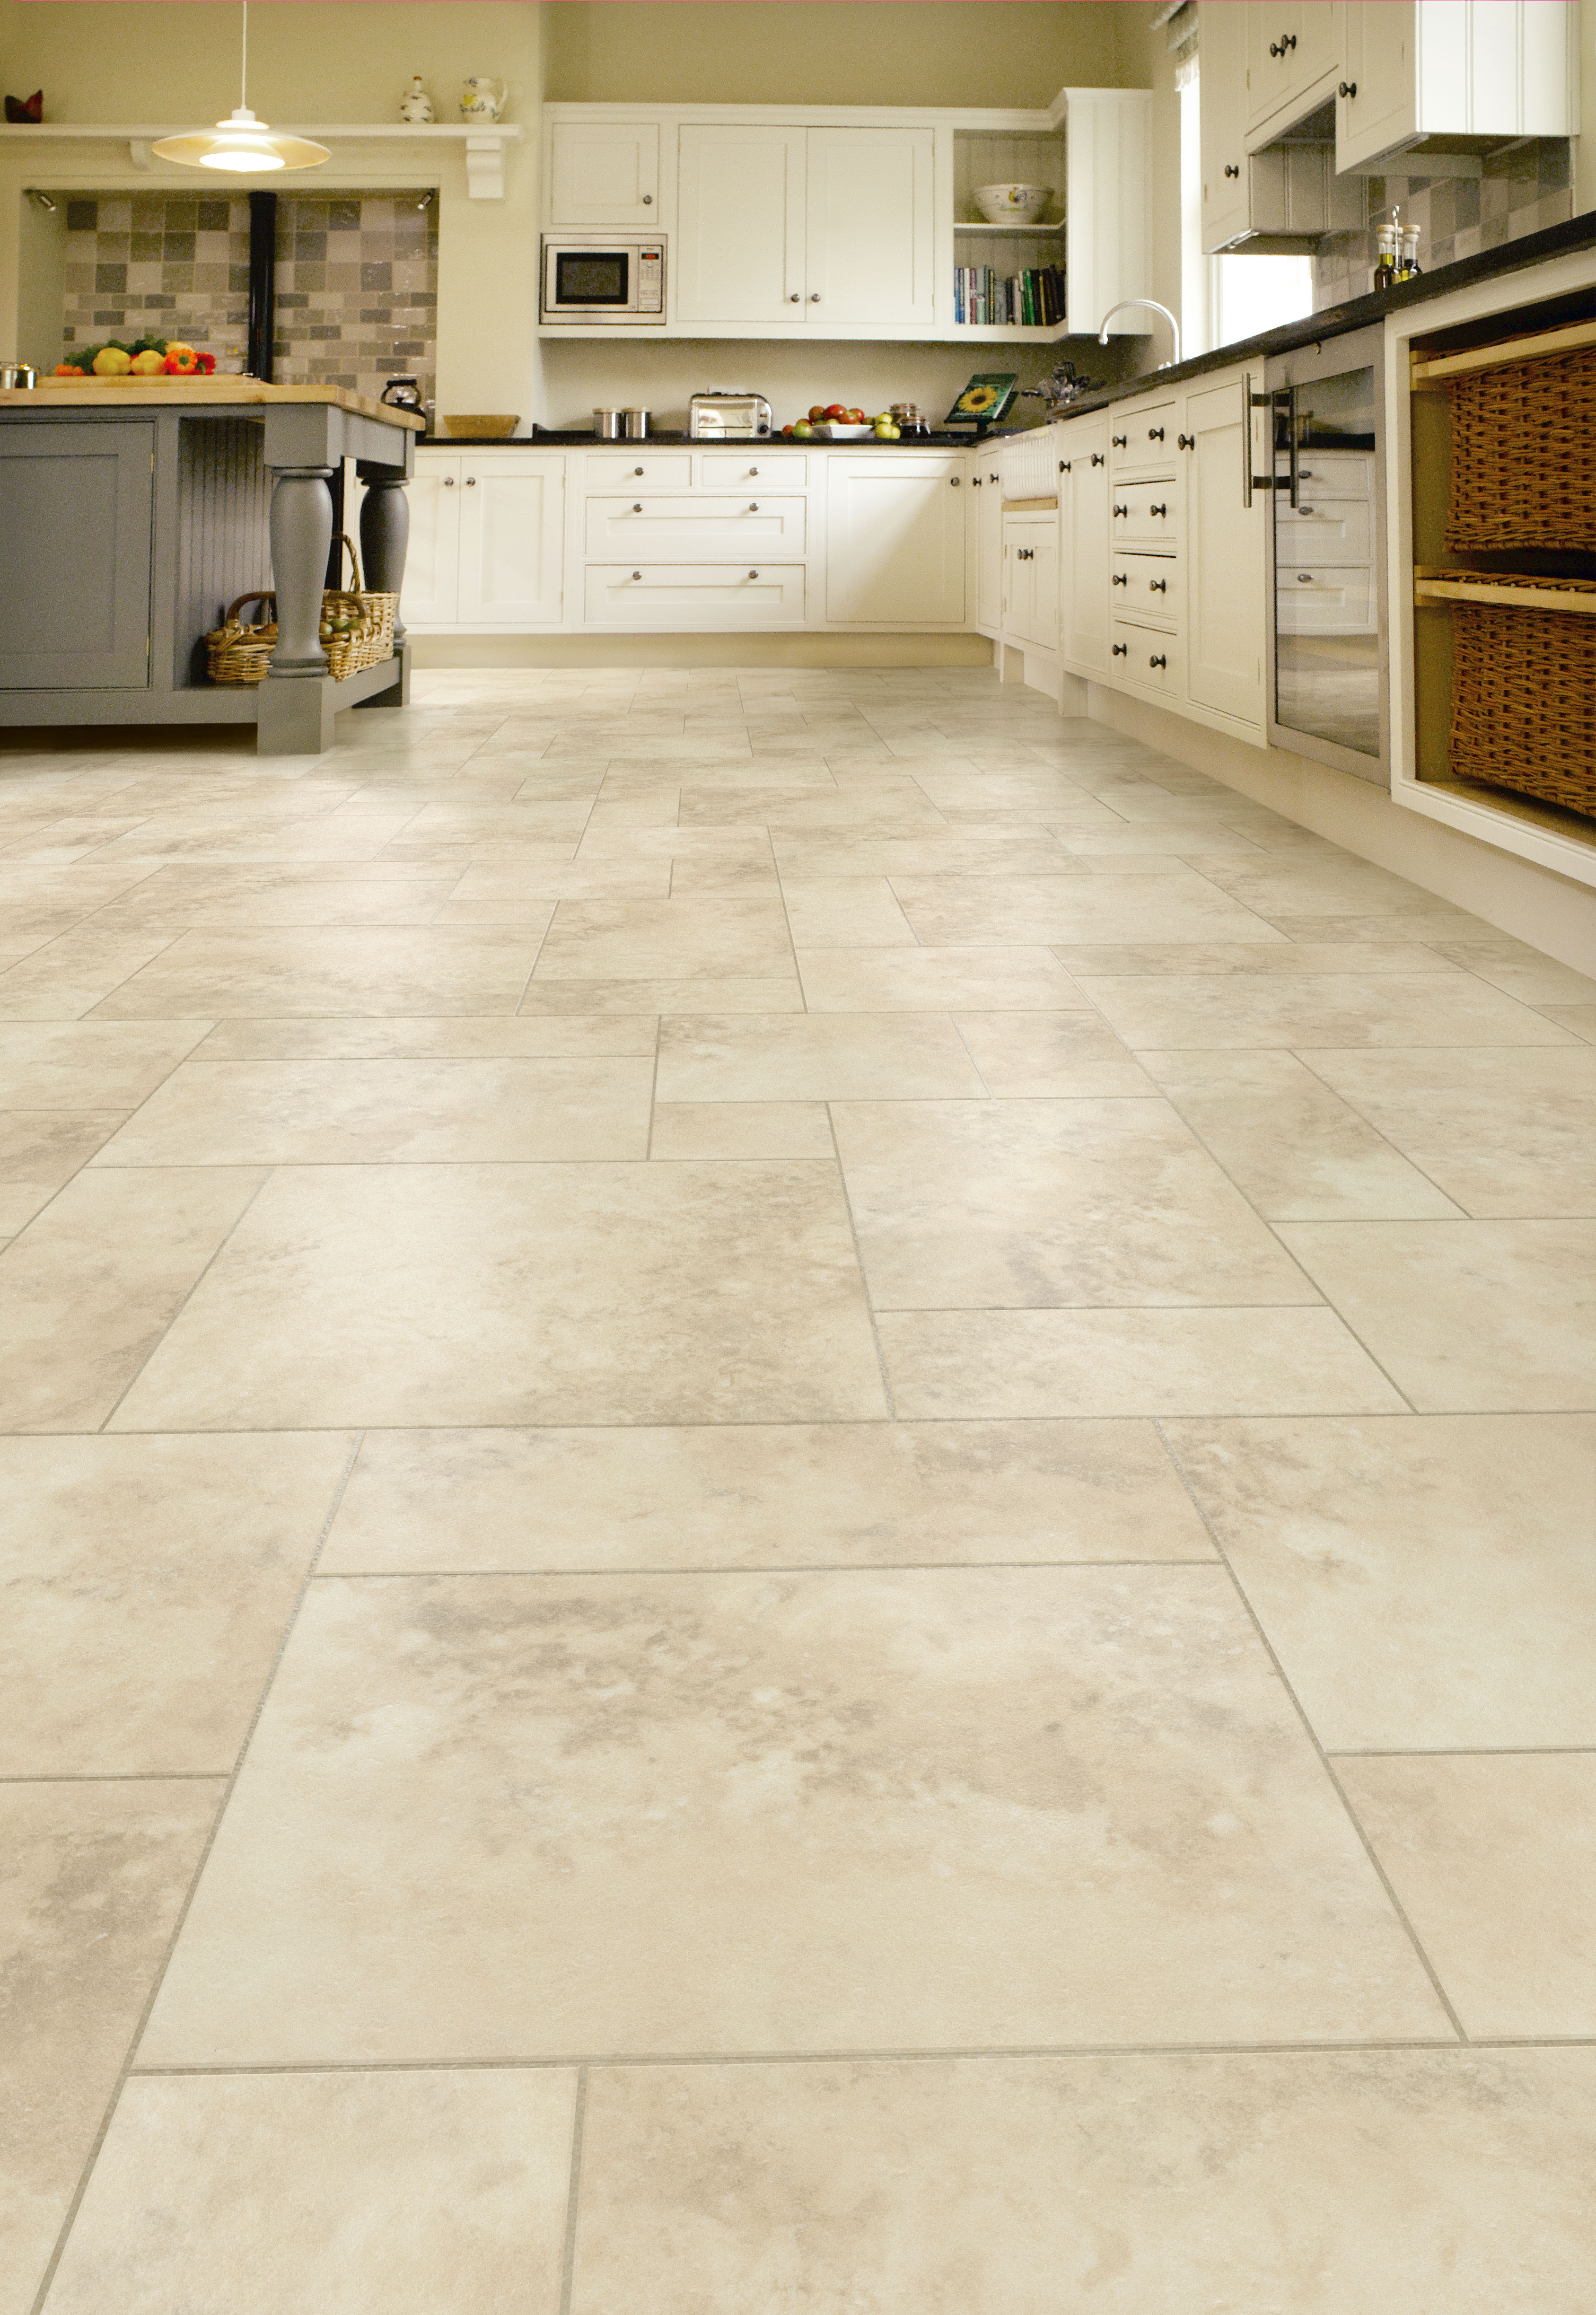 bolton in manchester luxury farnworth vinyl tile lvt floor karndean lancashire flooring